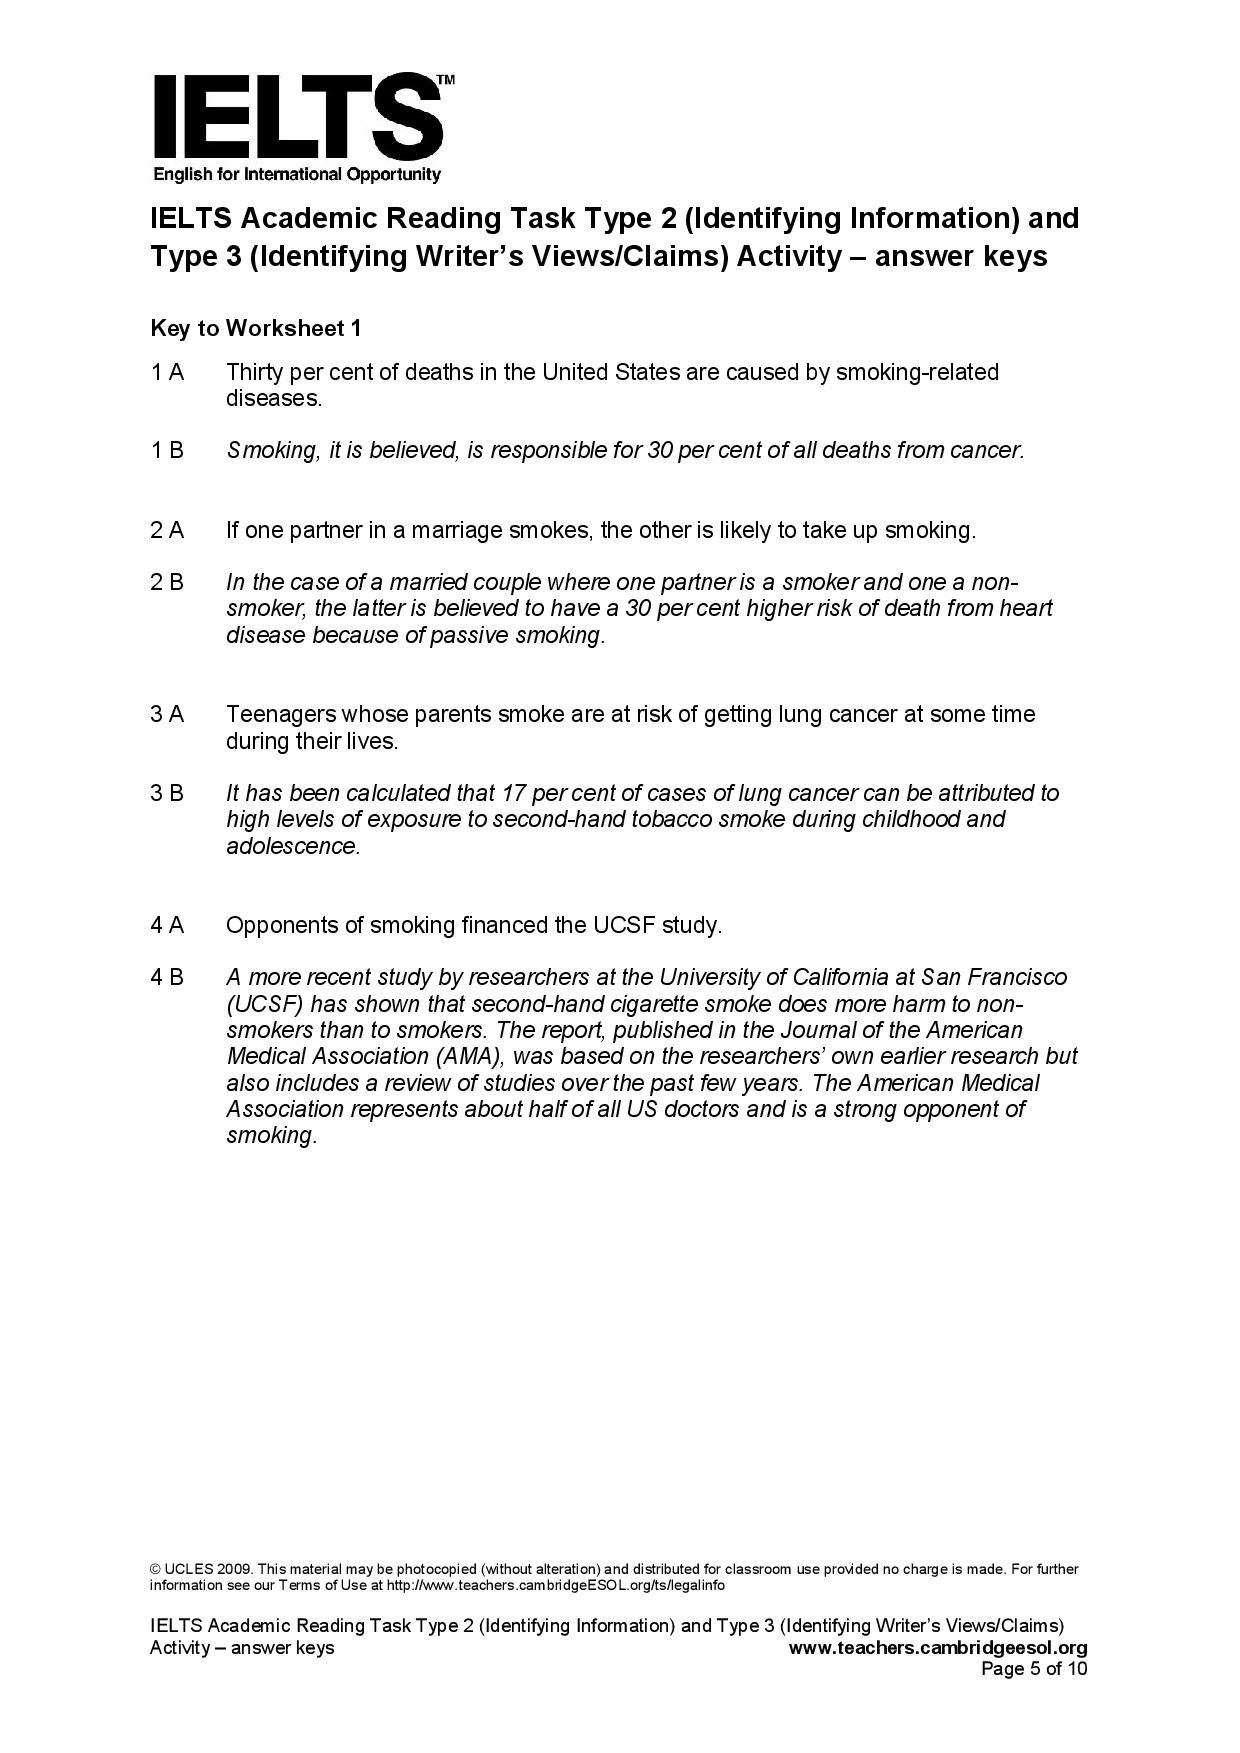 Ielts Academic Reading Task Type 2 Identifying Information And Type 3 Identifying Writer S